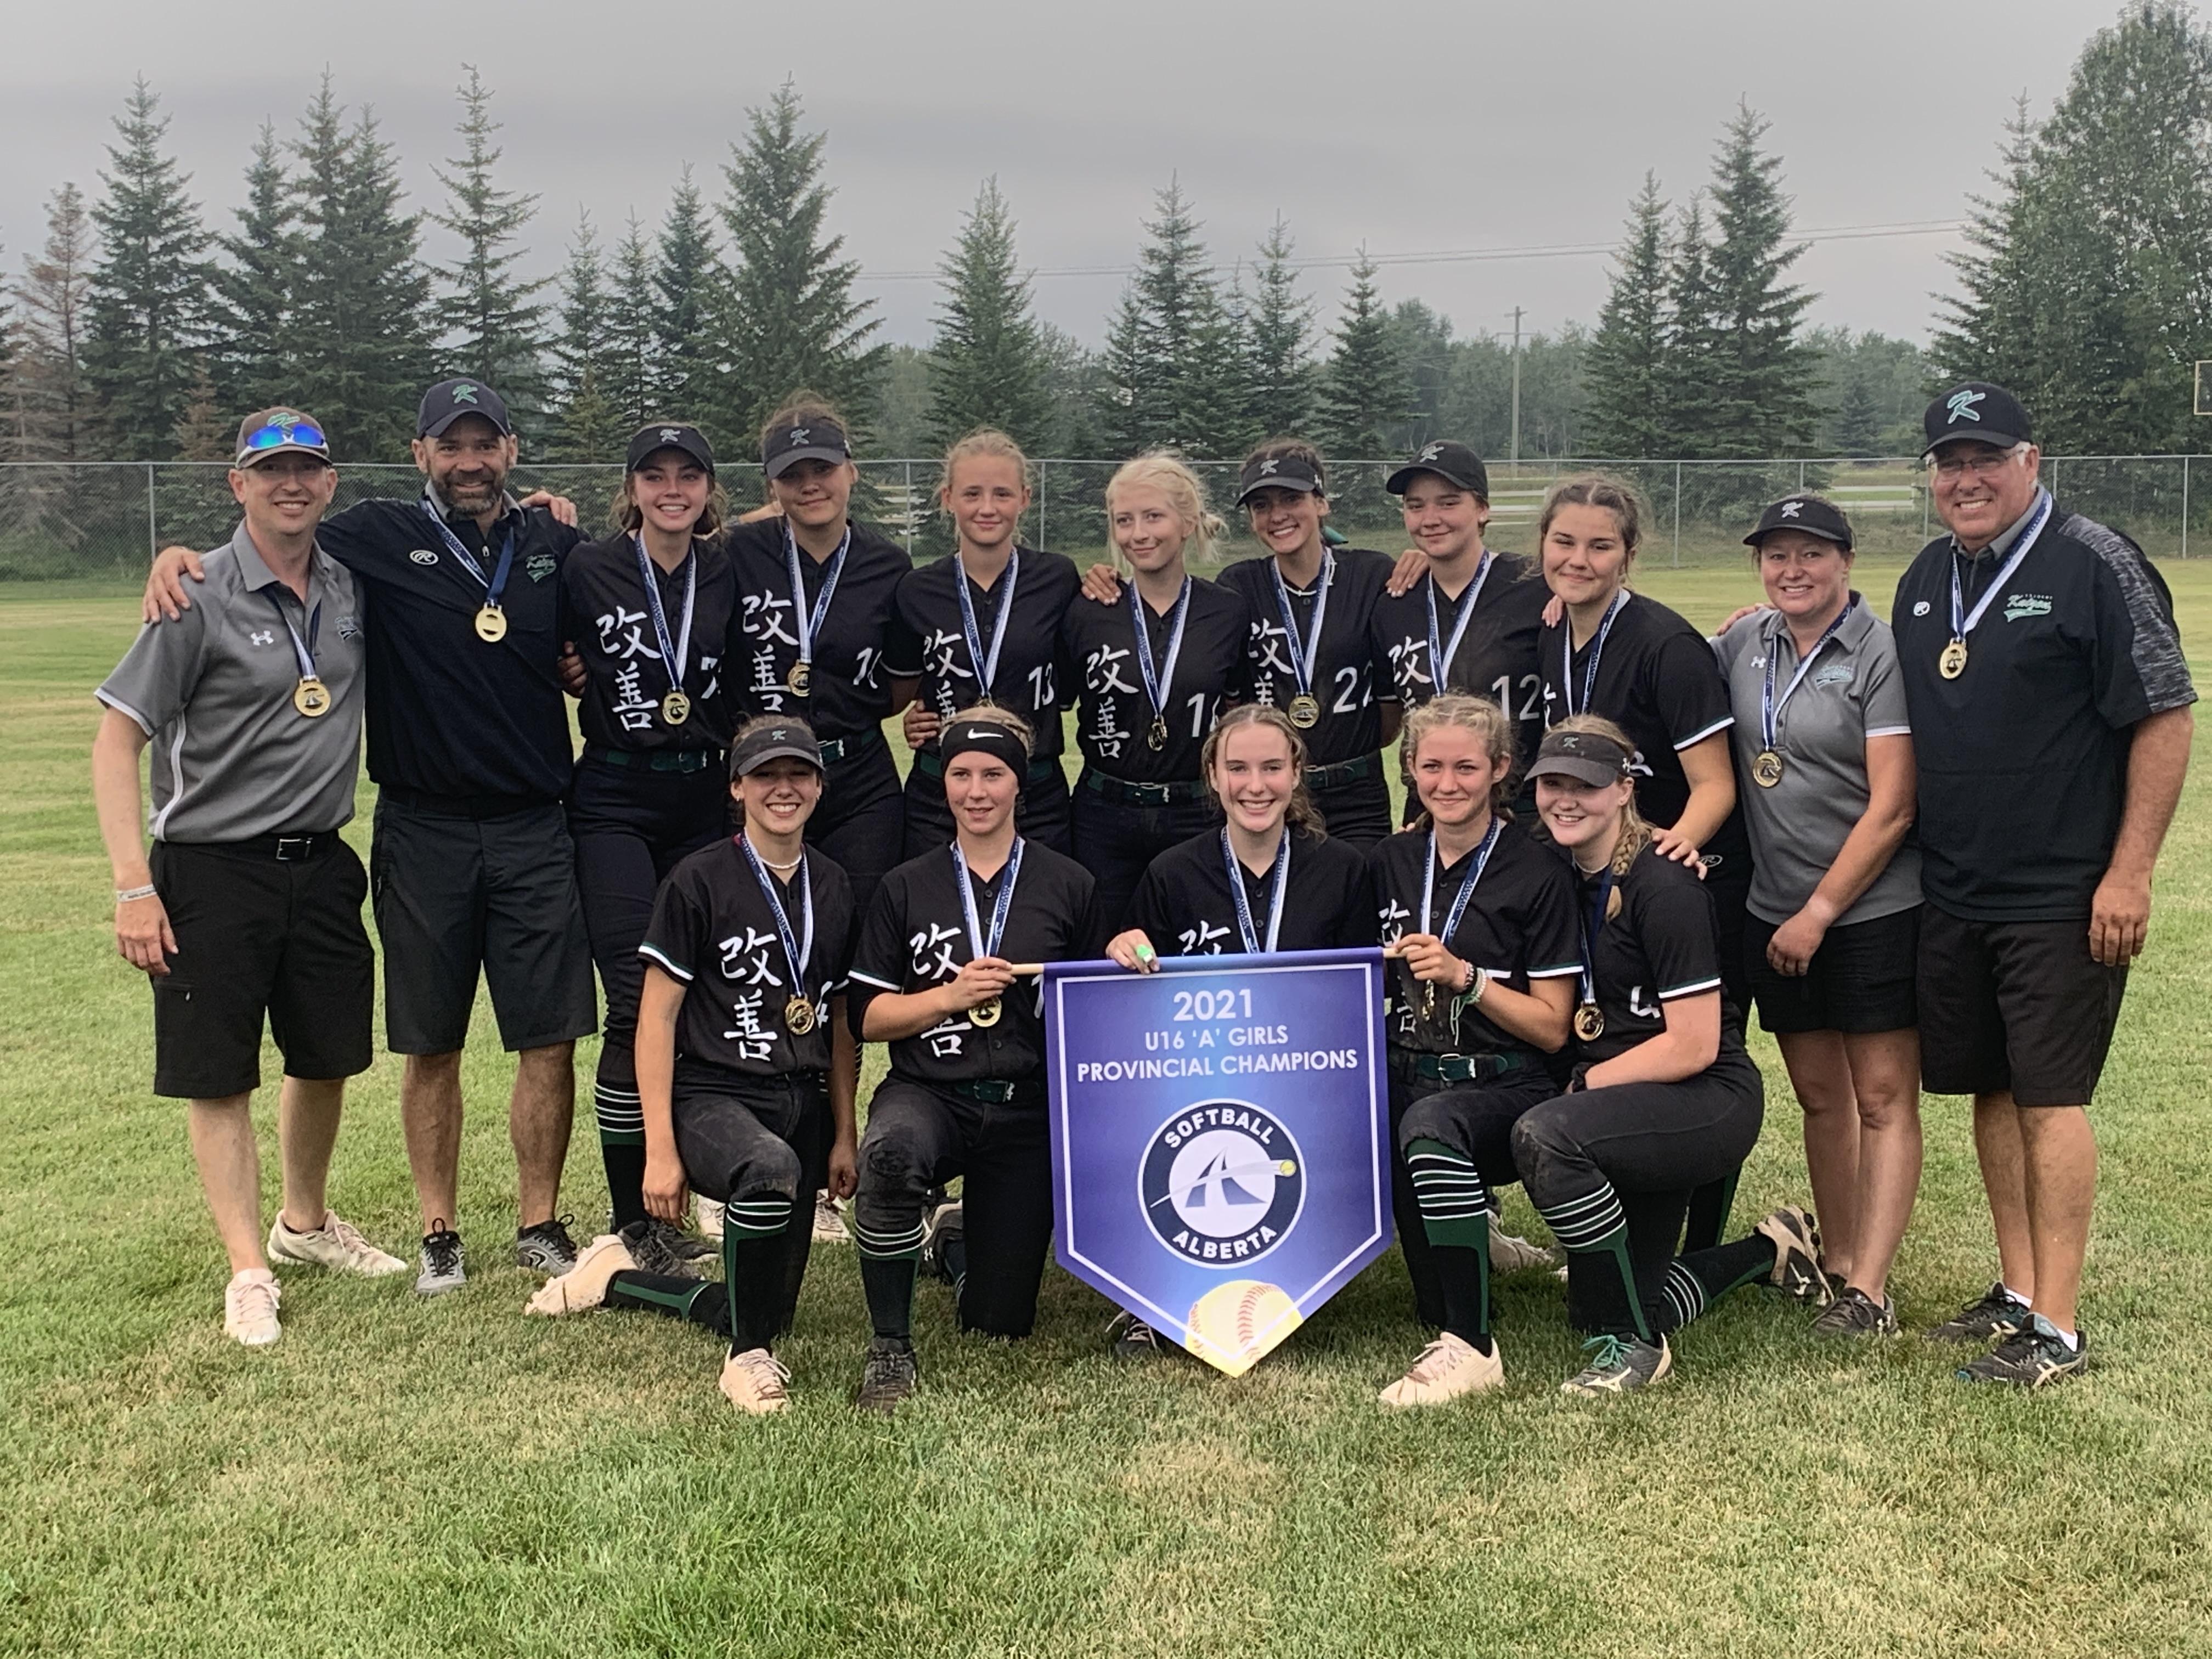 U16 Black Gold Provincial Championships 2021